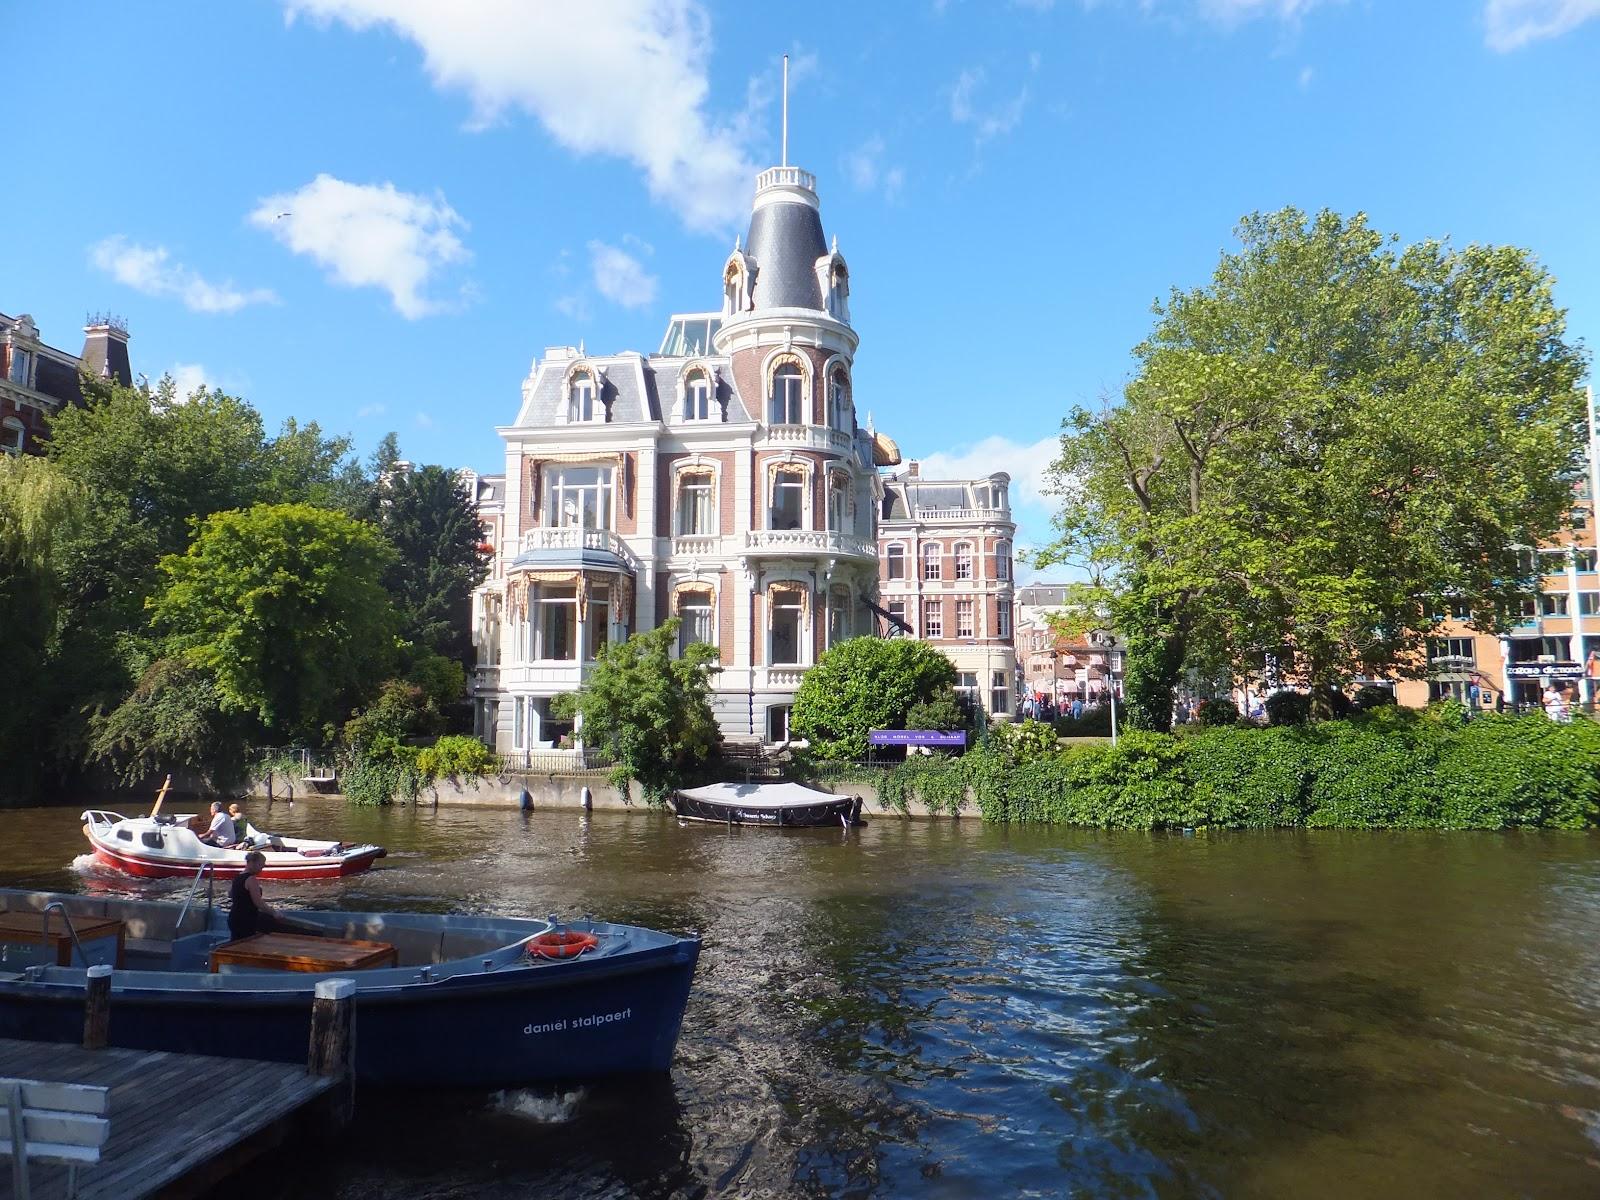 Viaja a Amsterdam, Holanda, Países Bajos, Elisa N, Blog de Viajes, Lifestyle, Travel